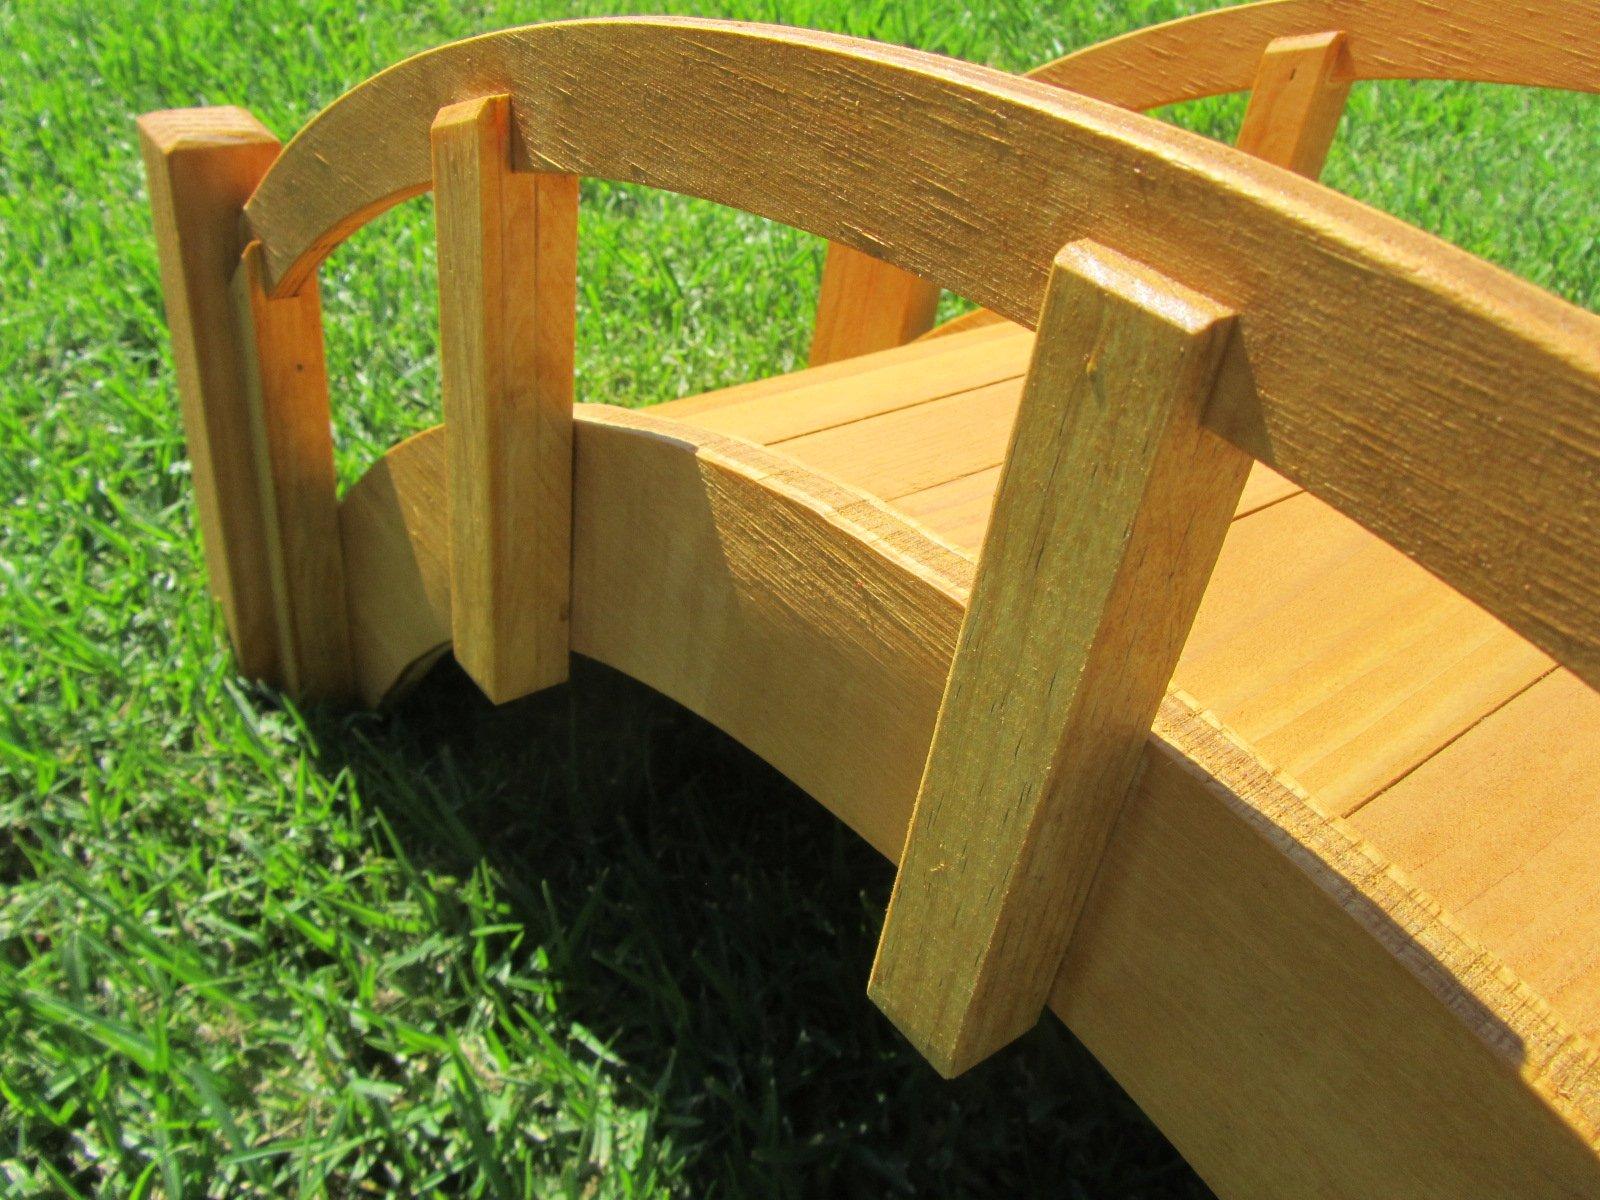 SamsGazebos Miniature Japanese Waterproofed Wood Garden Bridge, 25-Inch, Tan by SamsGazebosTM (Image #2)